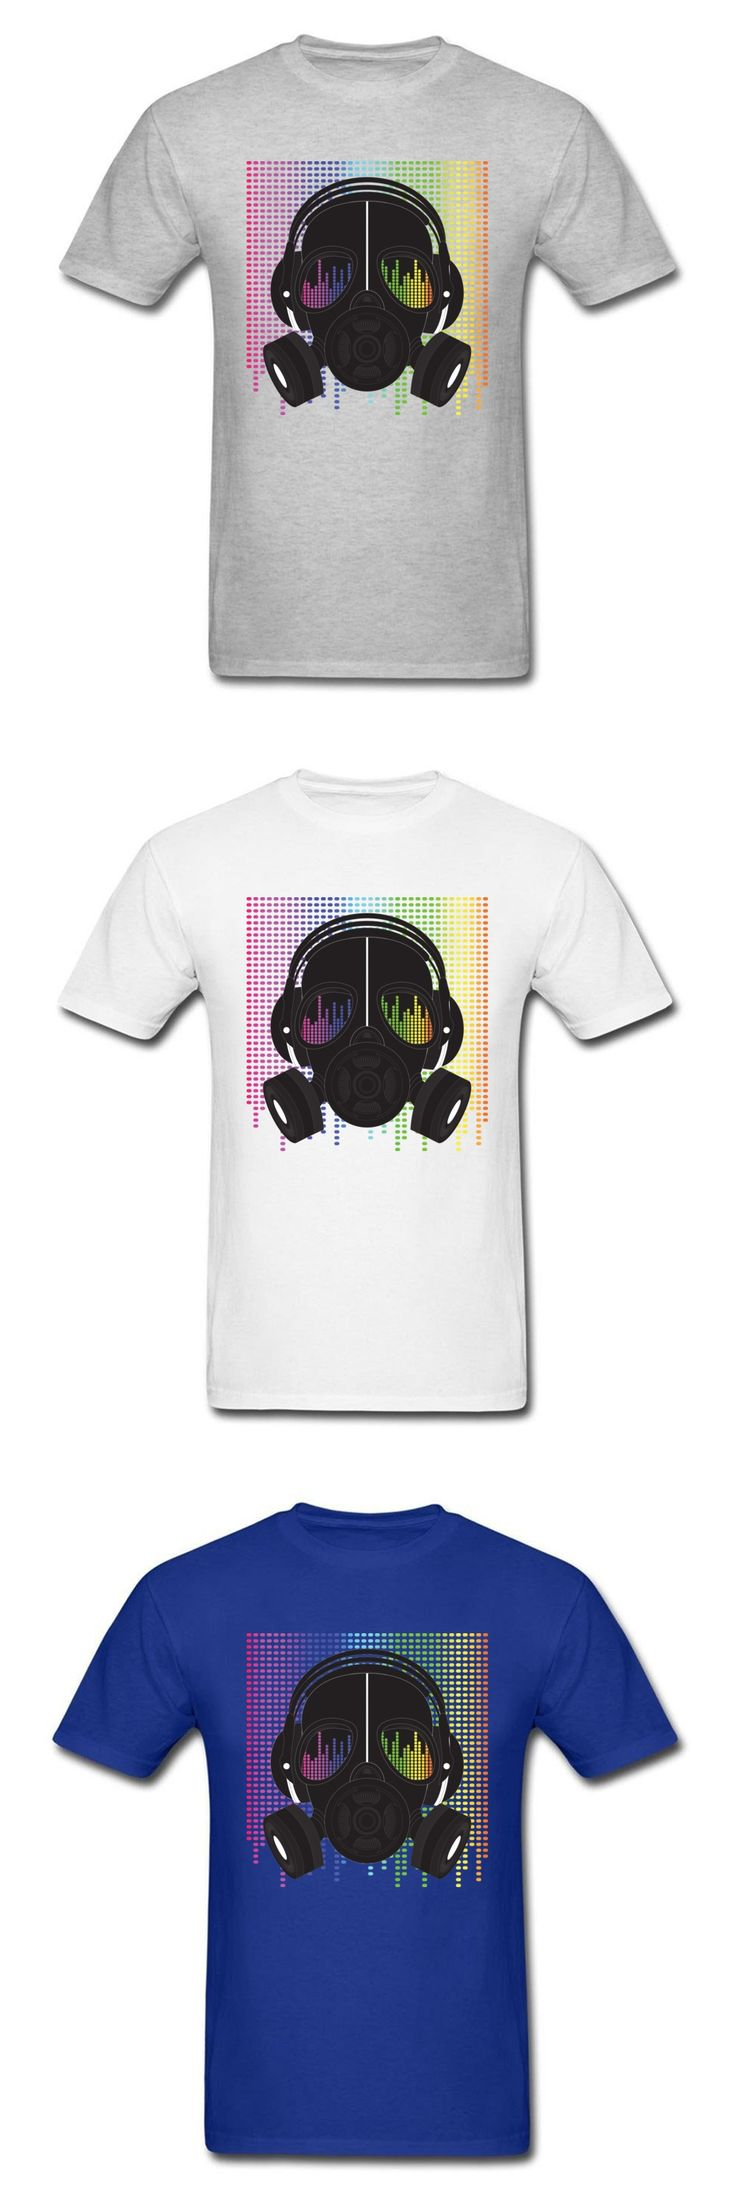 Custom DJ Masked Beats T Shirts 2018 Latest Design Pure Cotton O Neck Tops T-Shirt For Male Hip Hop Dance Tee Shirts On Sale